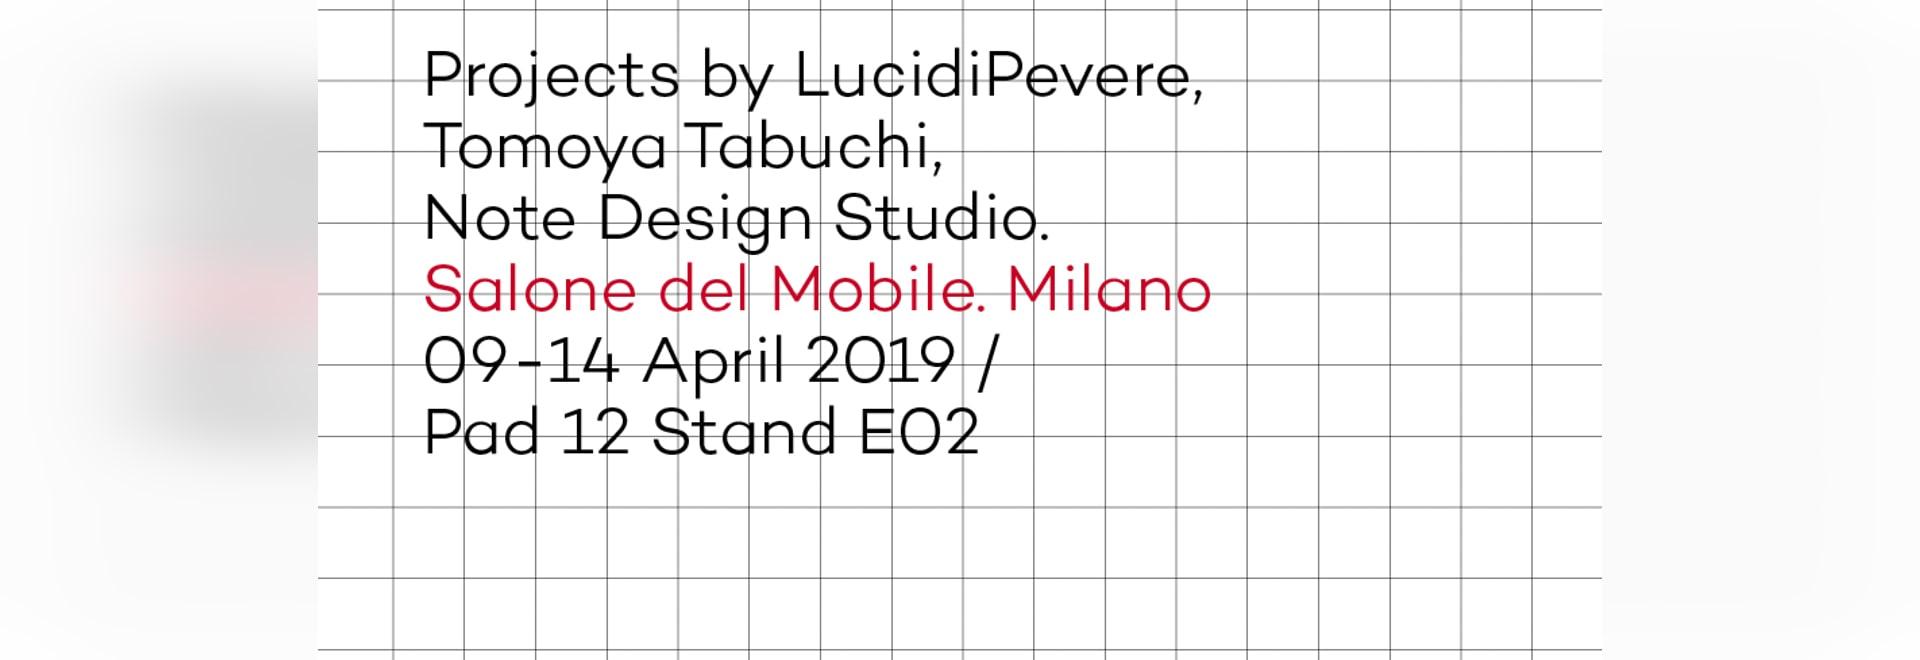 Arrmet at salone del Mobile, invitation